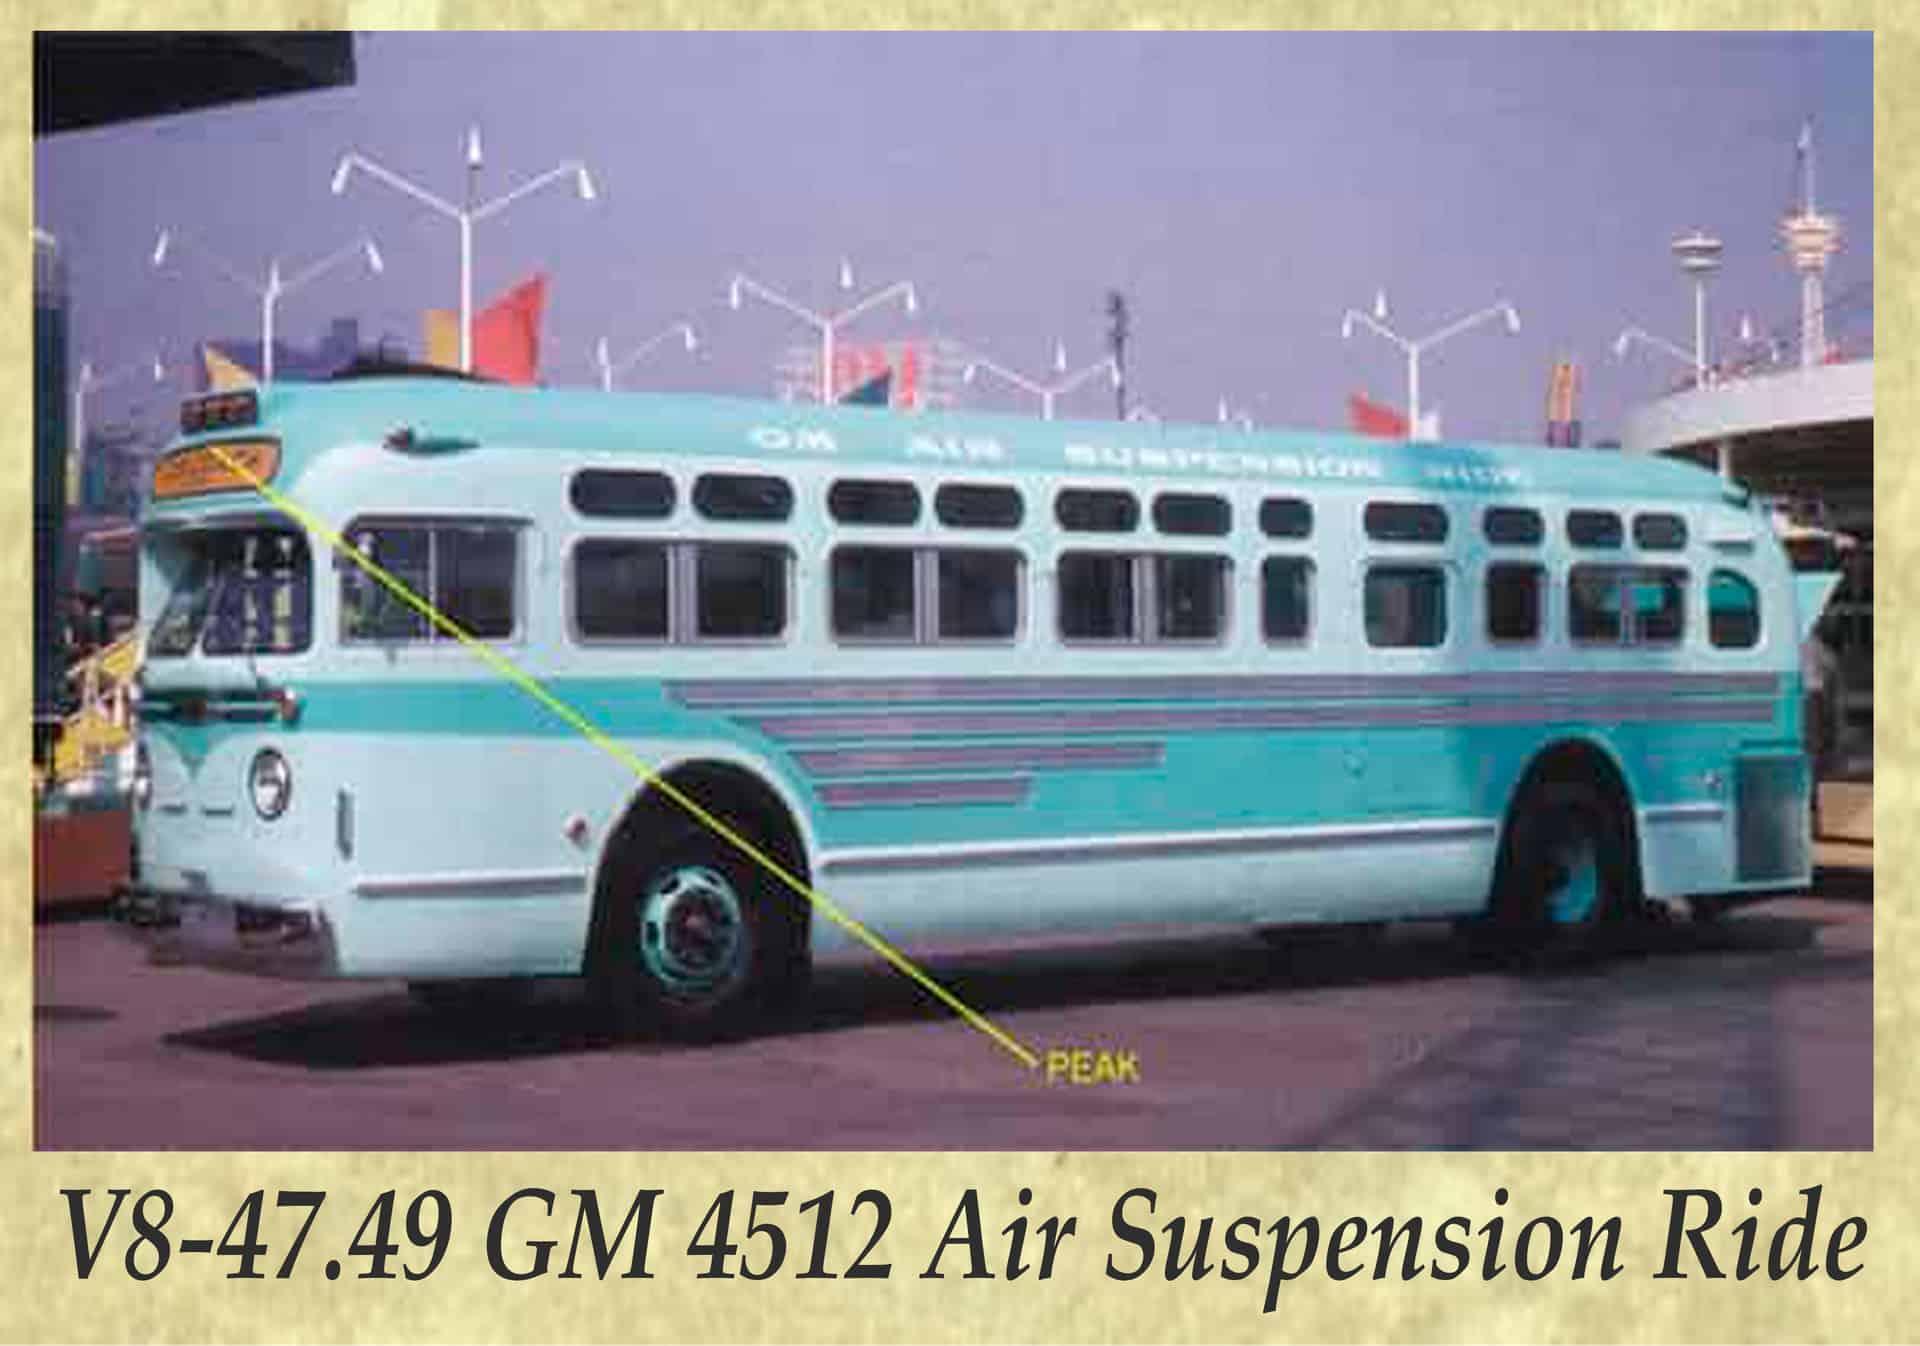 V8-47.49 GM 4512 Air Suspension Ride